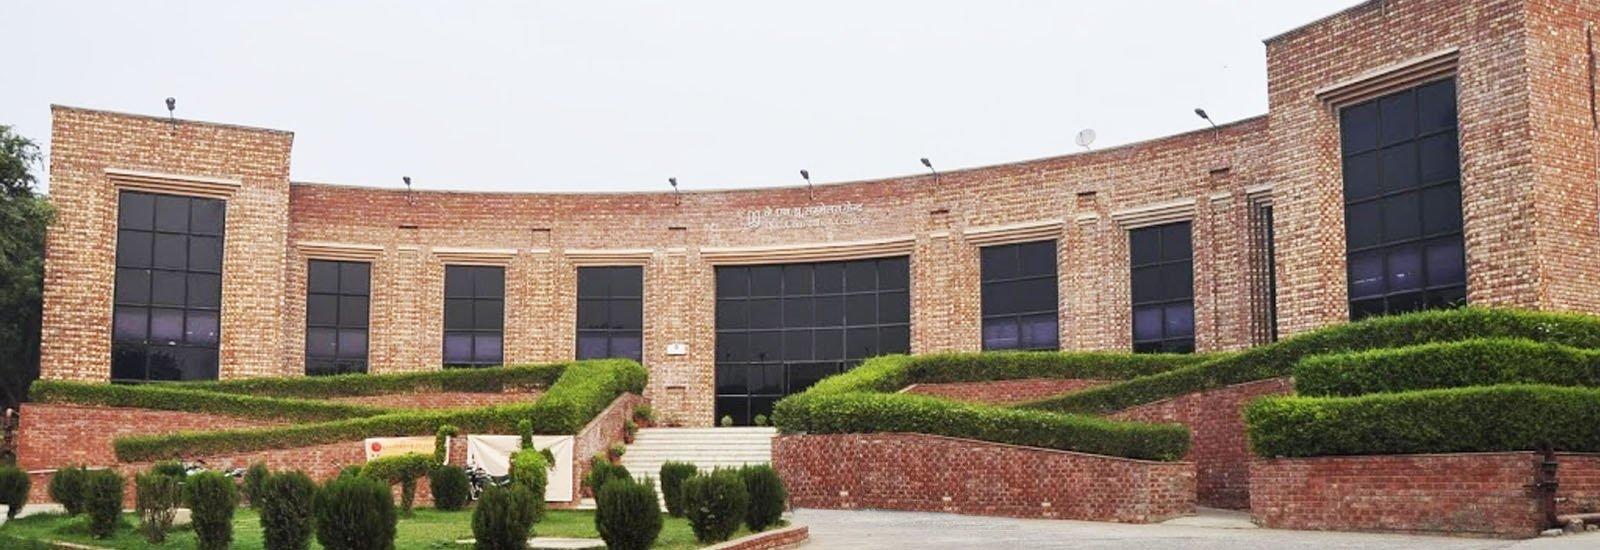 Jawaharlal Nehru University, New Delhi Image